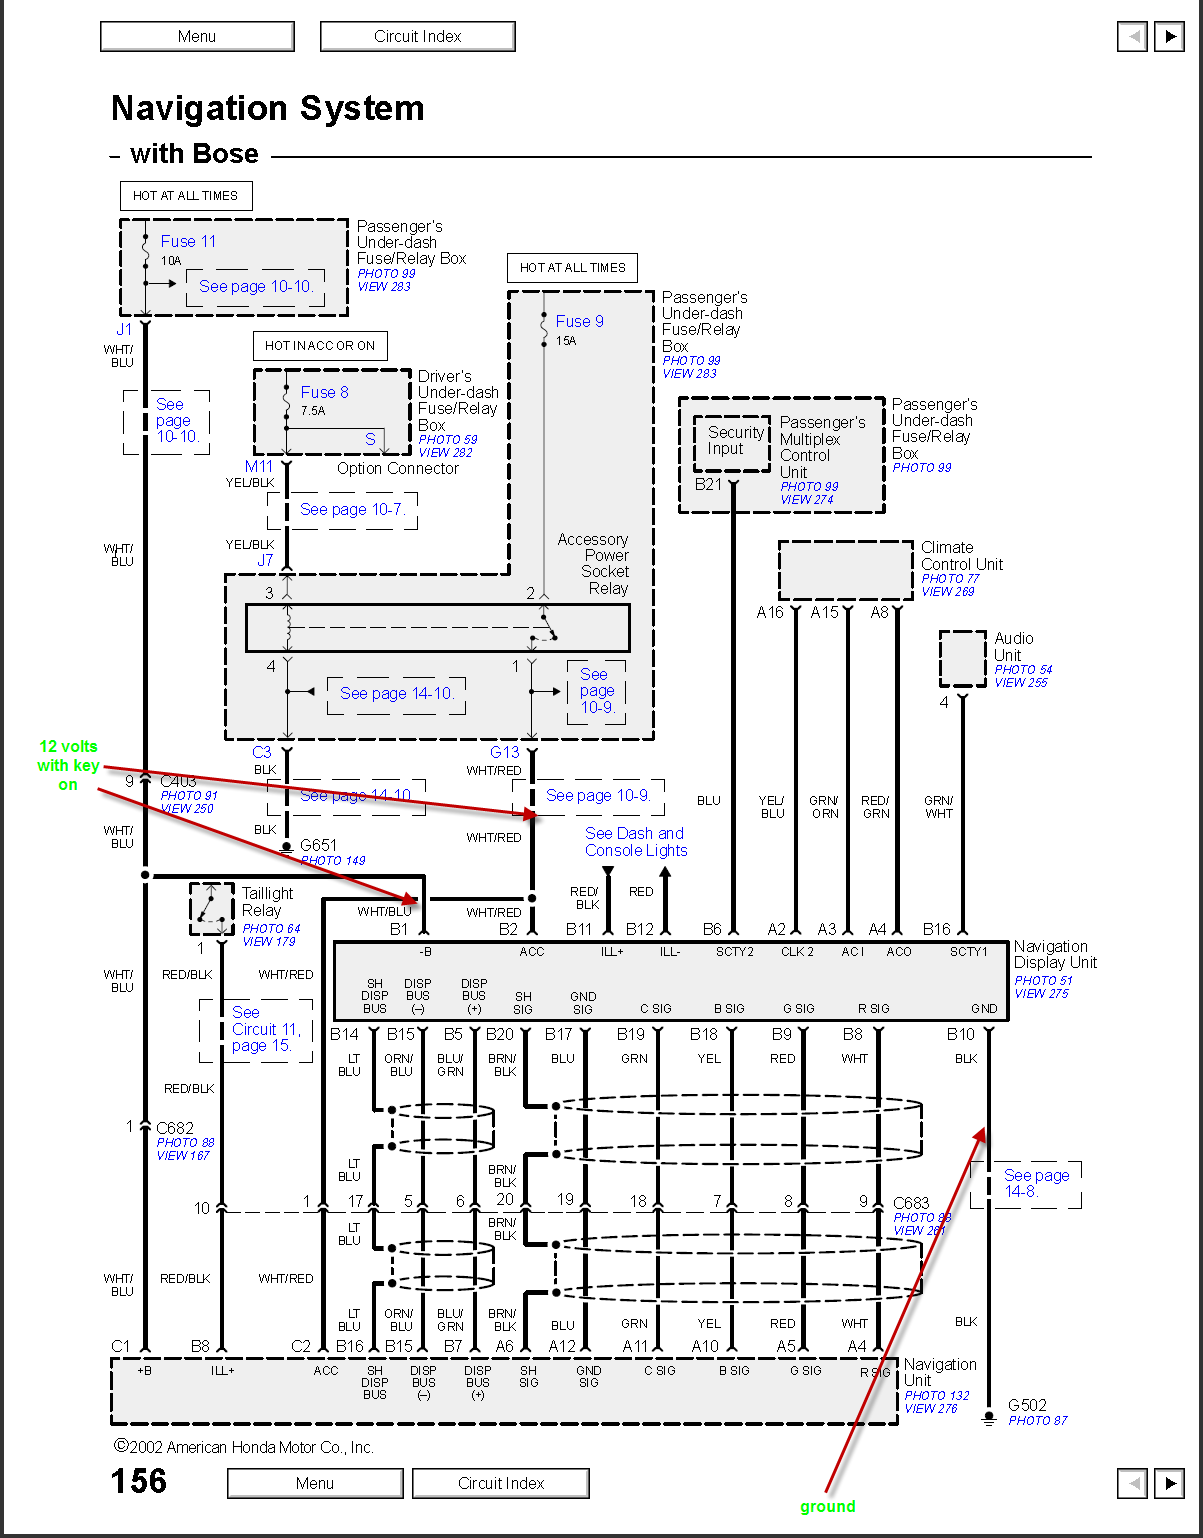 Acura Rsx Wiring Diagram Radio - Wiring Diagram